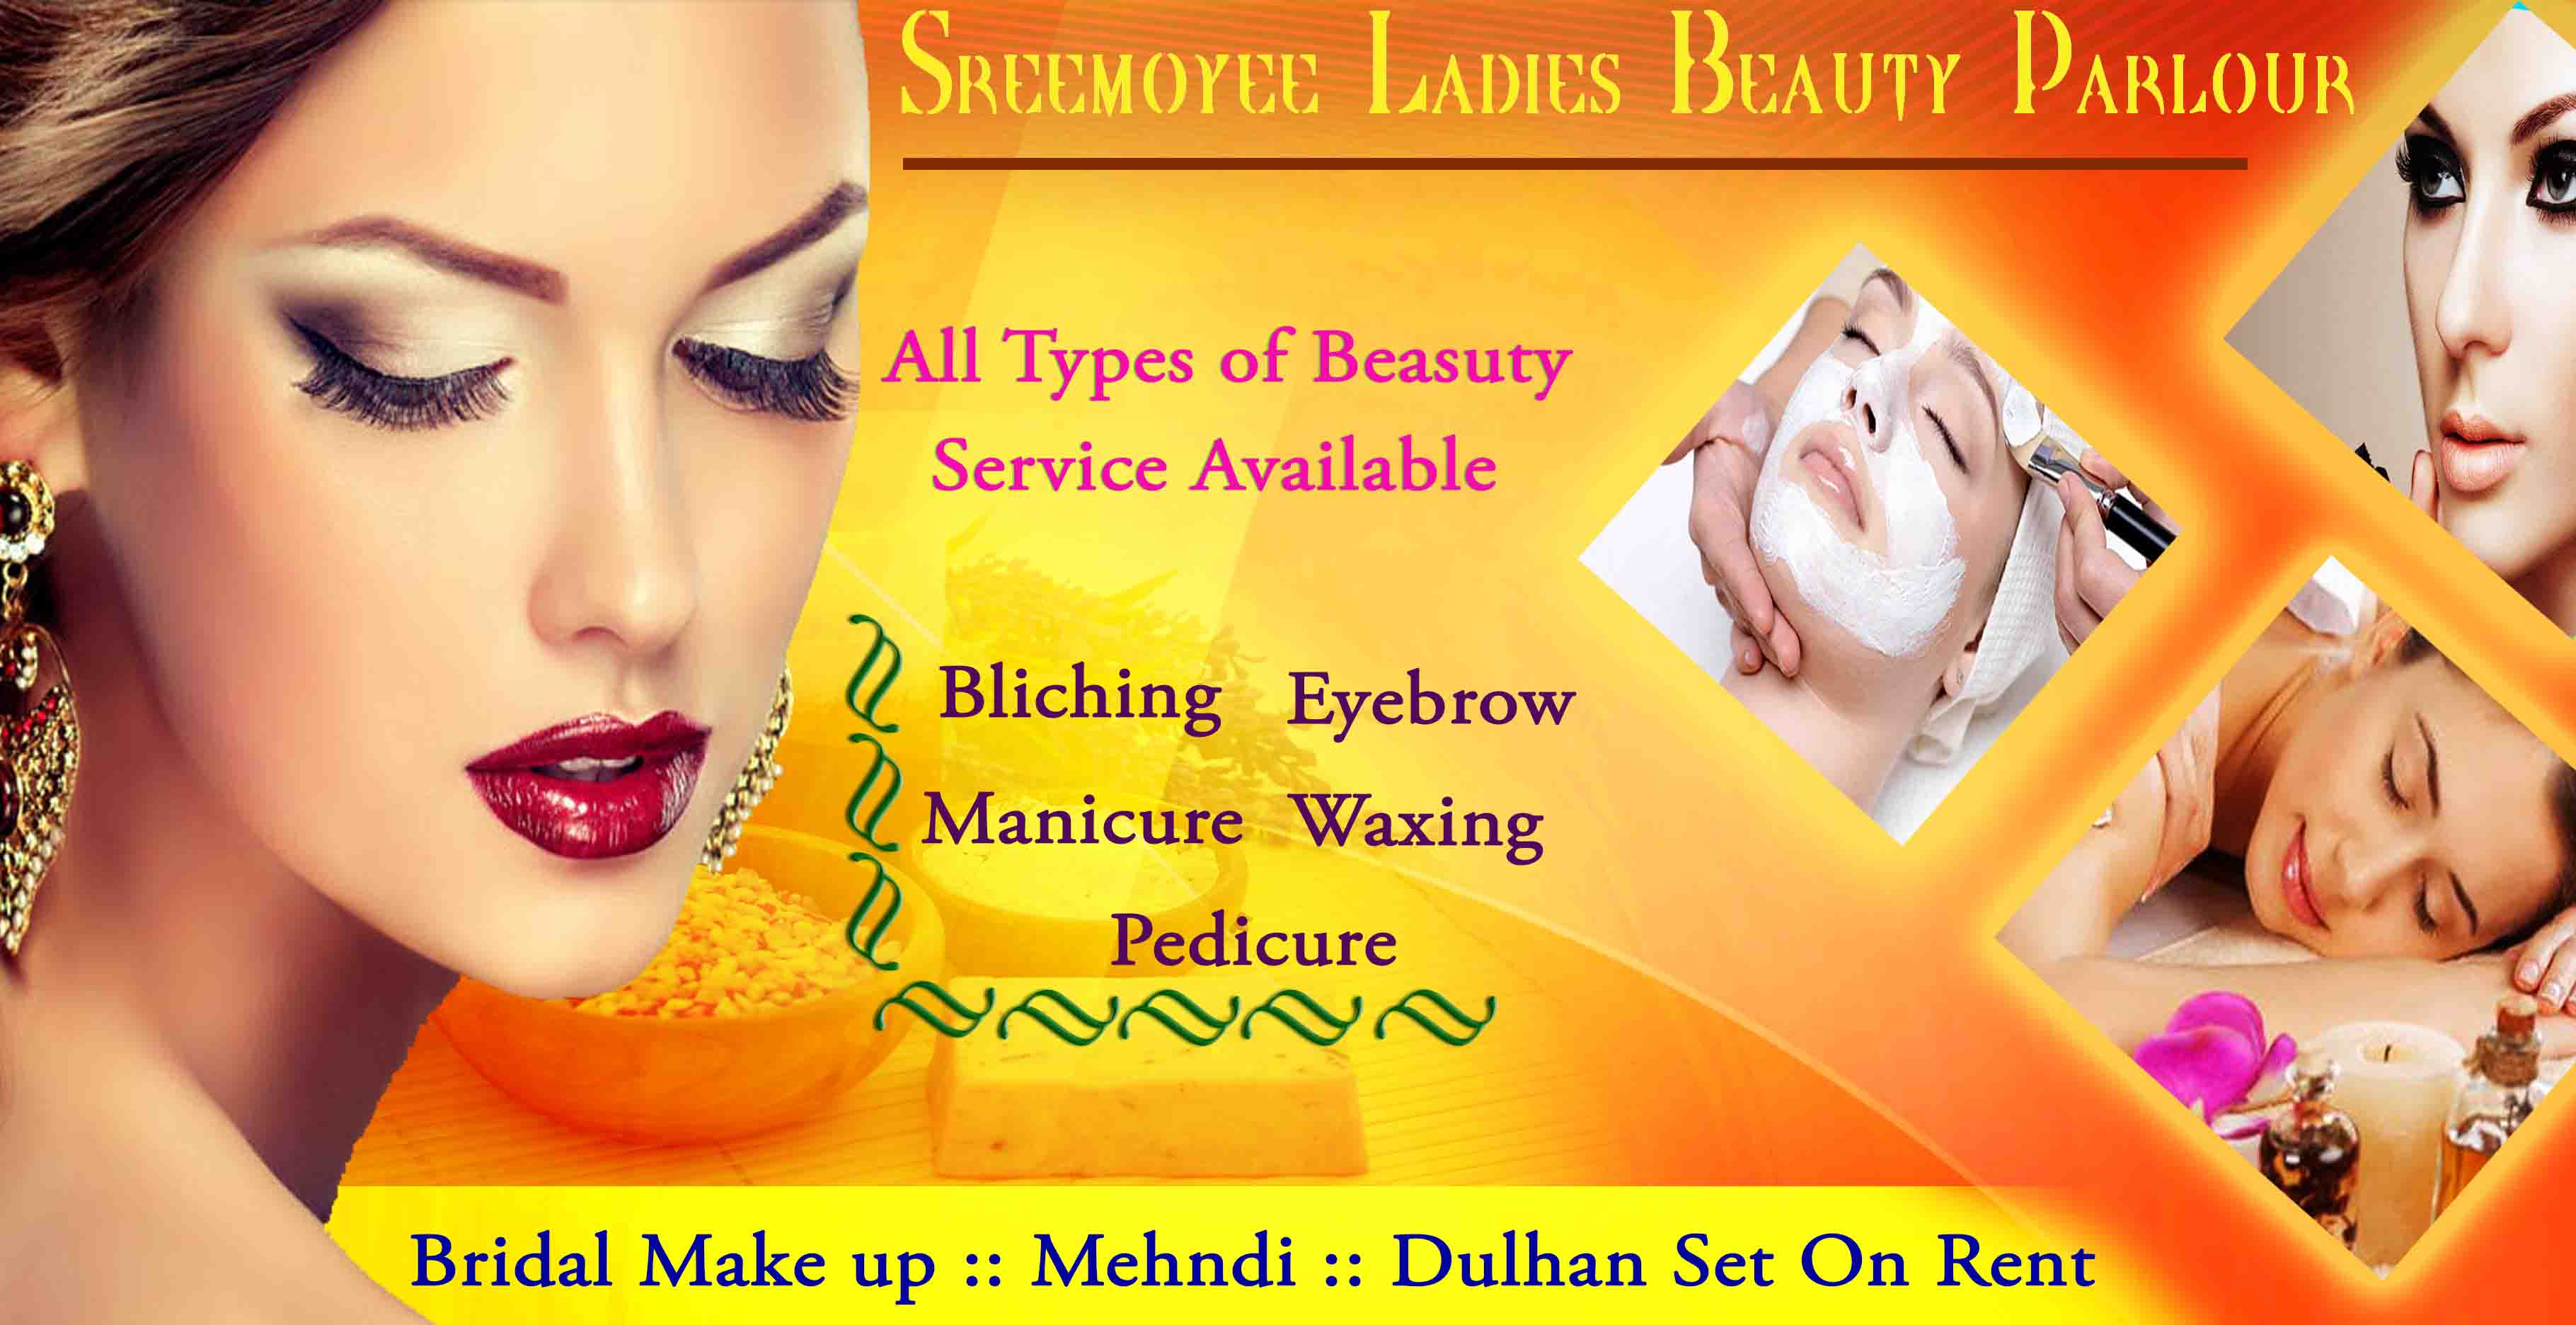 Beauty Parlour Banner Design Picture Density